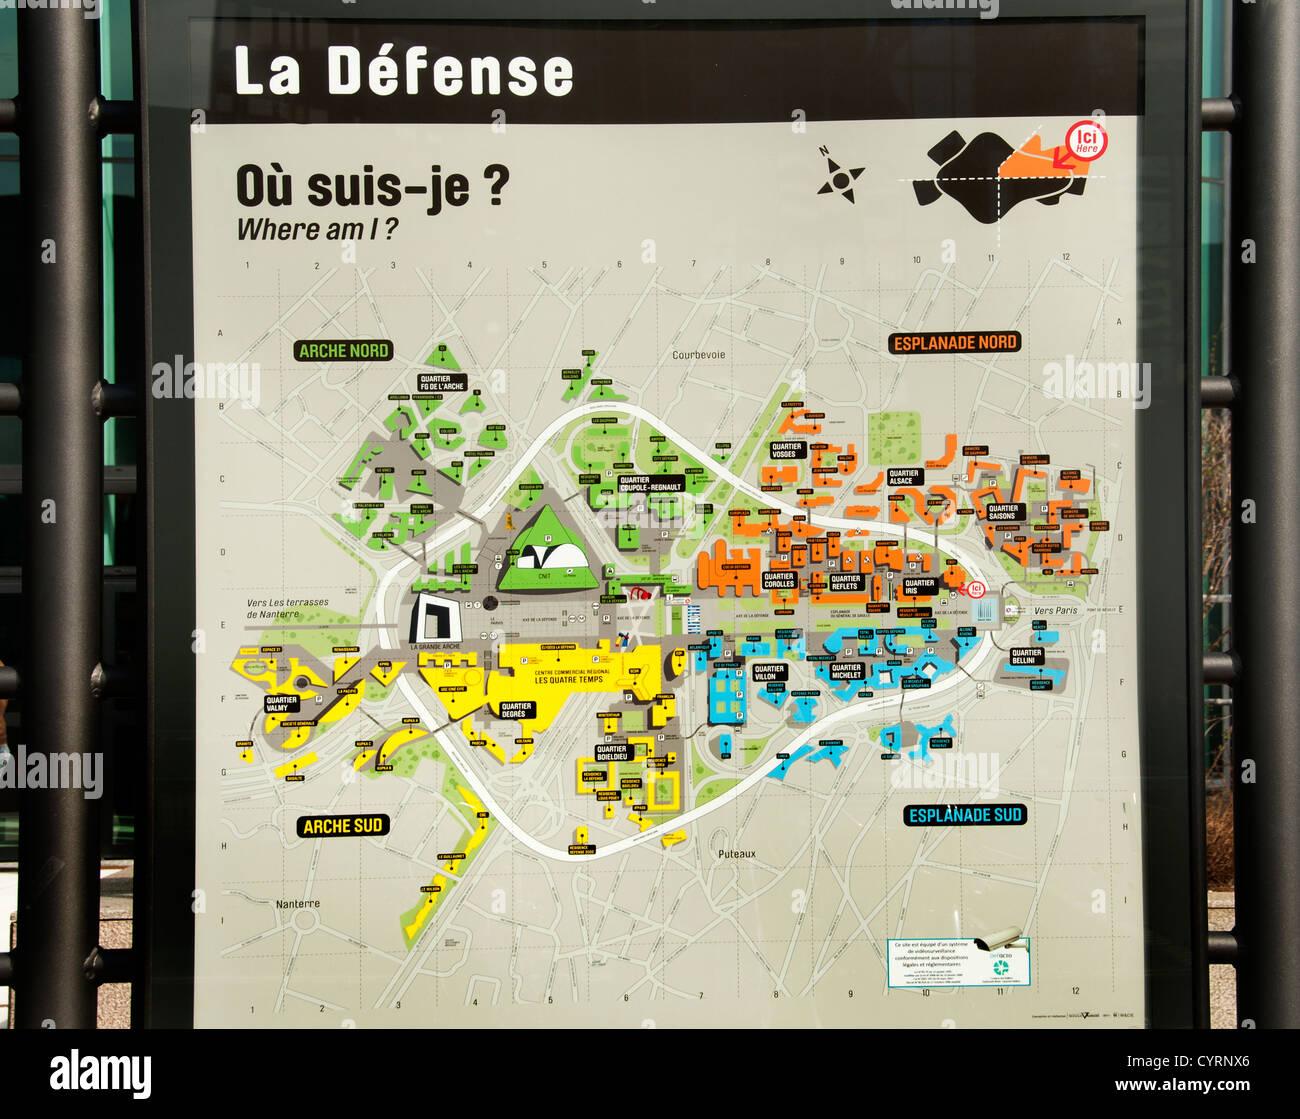 Paris La Defense French Street Map France Woman - Stock Image